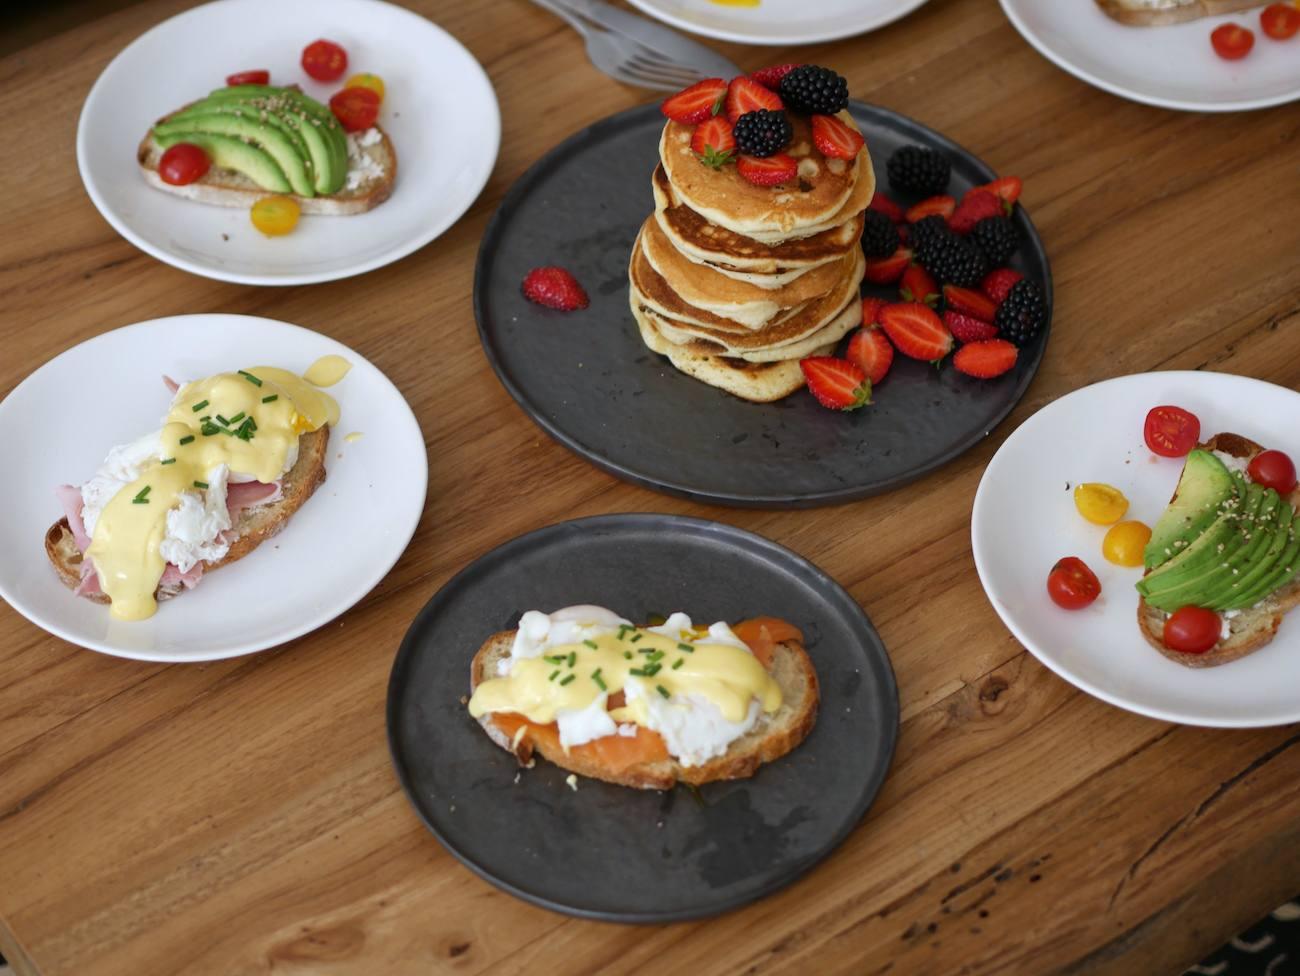 brunch-maison-recette-pancakes-toast-oeuf-benedicte-infuz-8